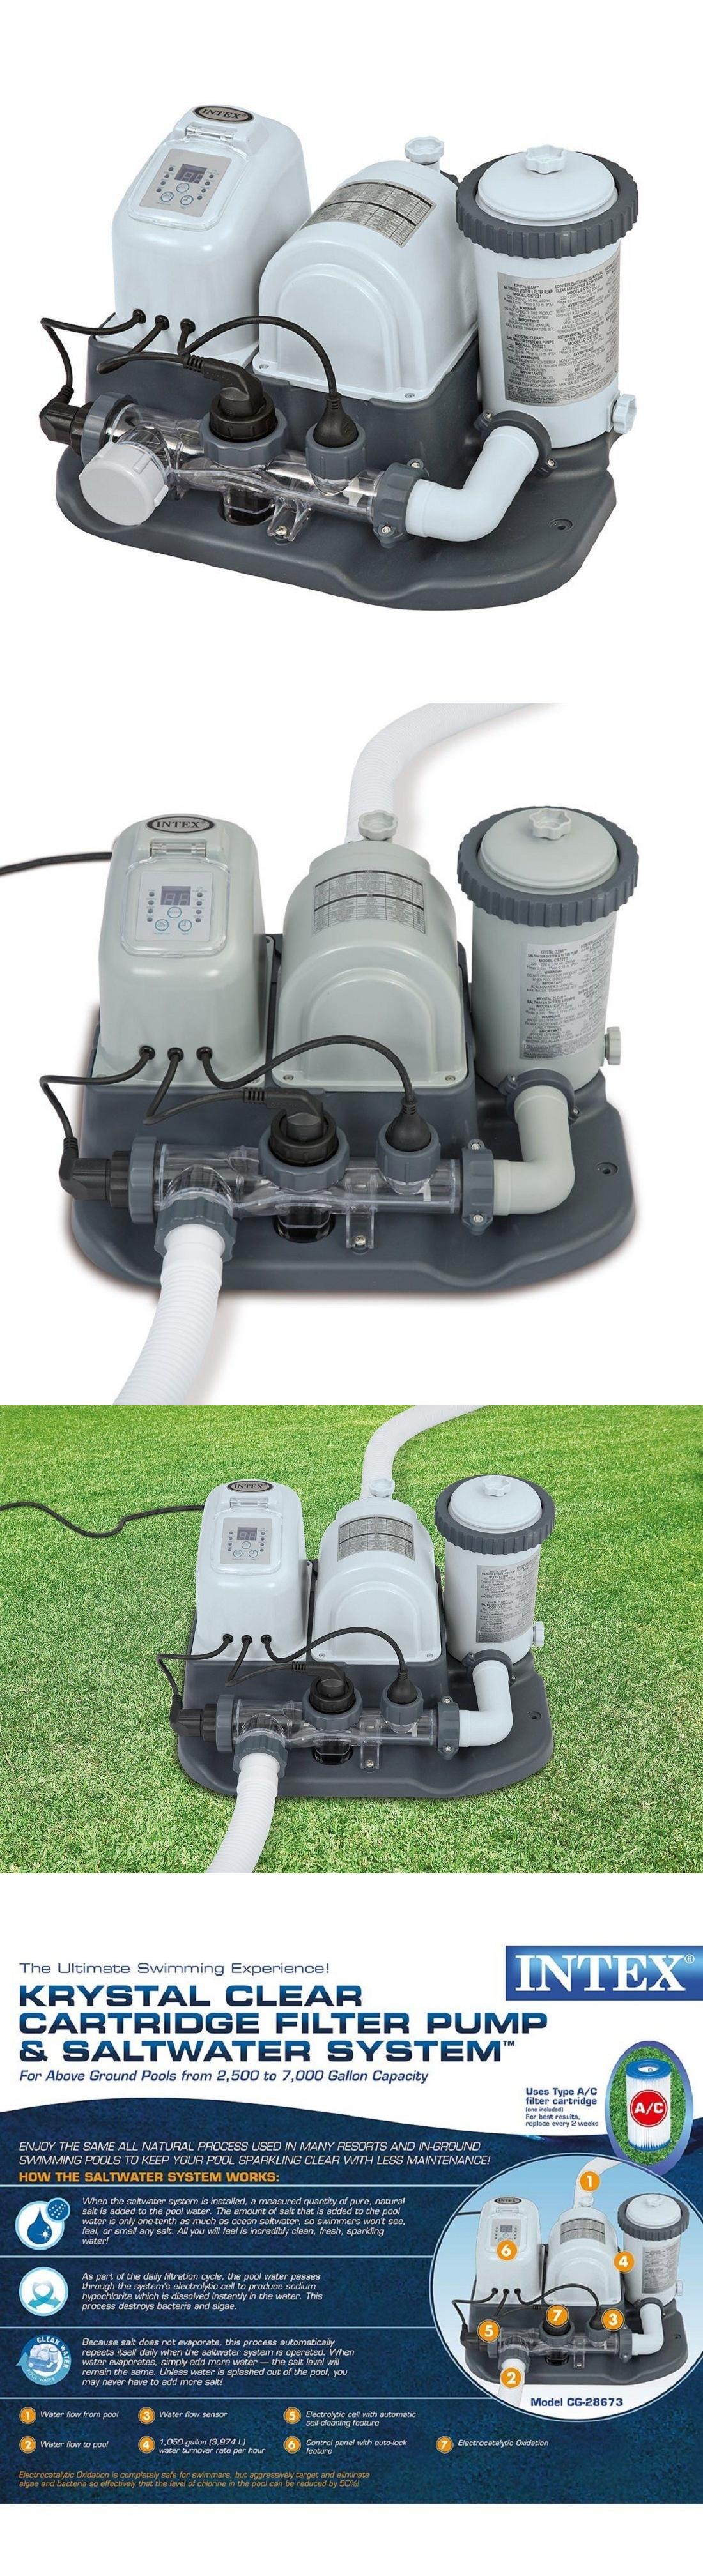 Pool Filters Brandnew Intex 120V Krystal Clear Saltwater